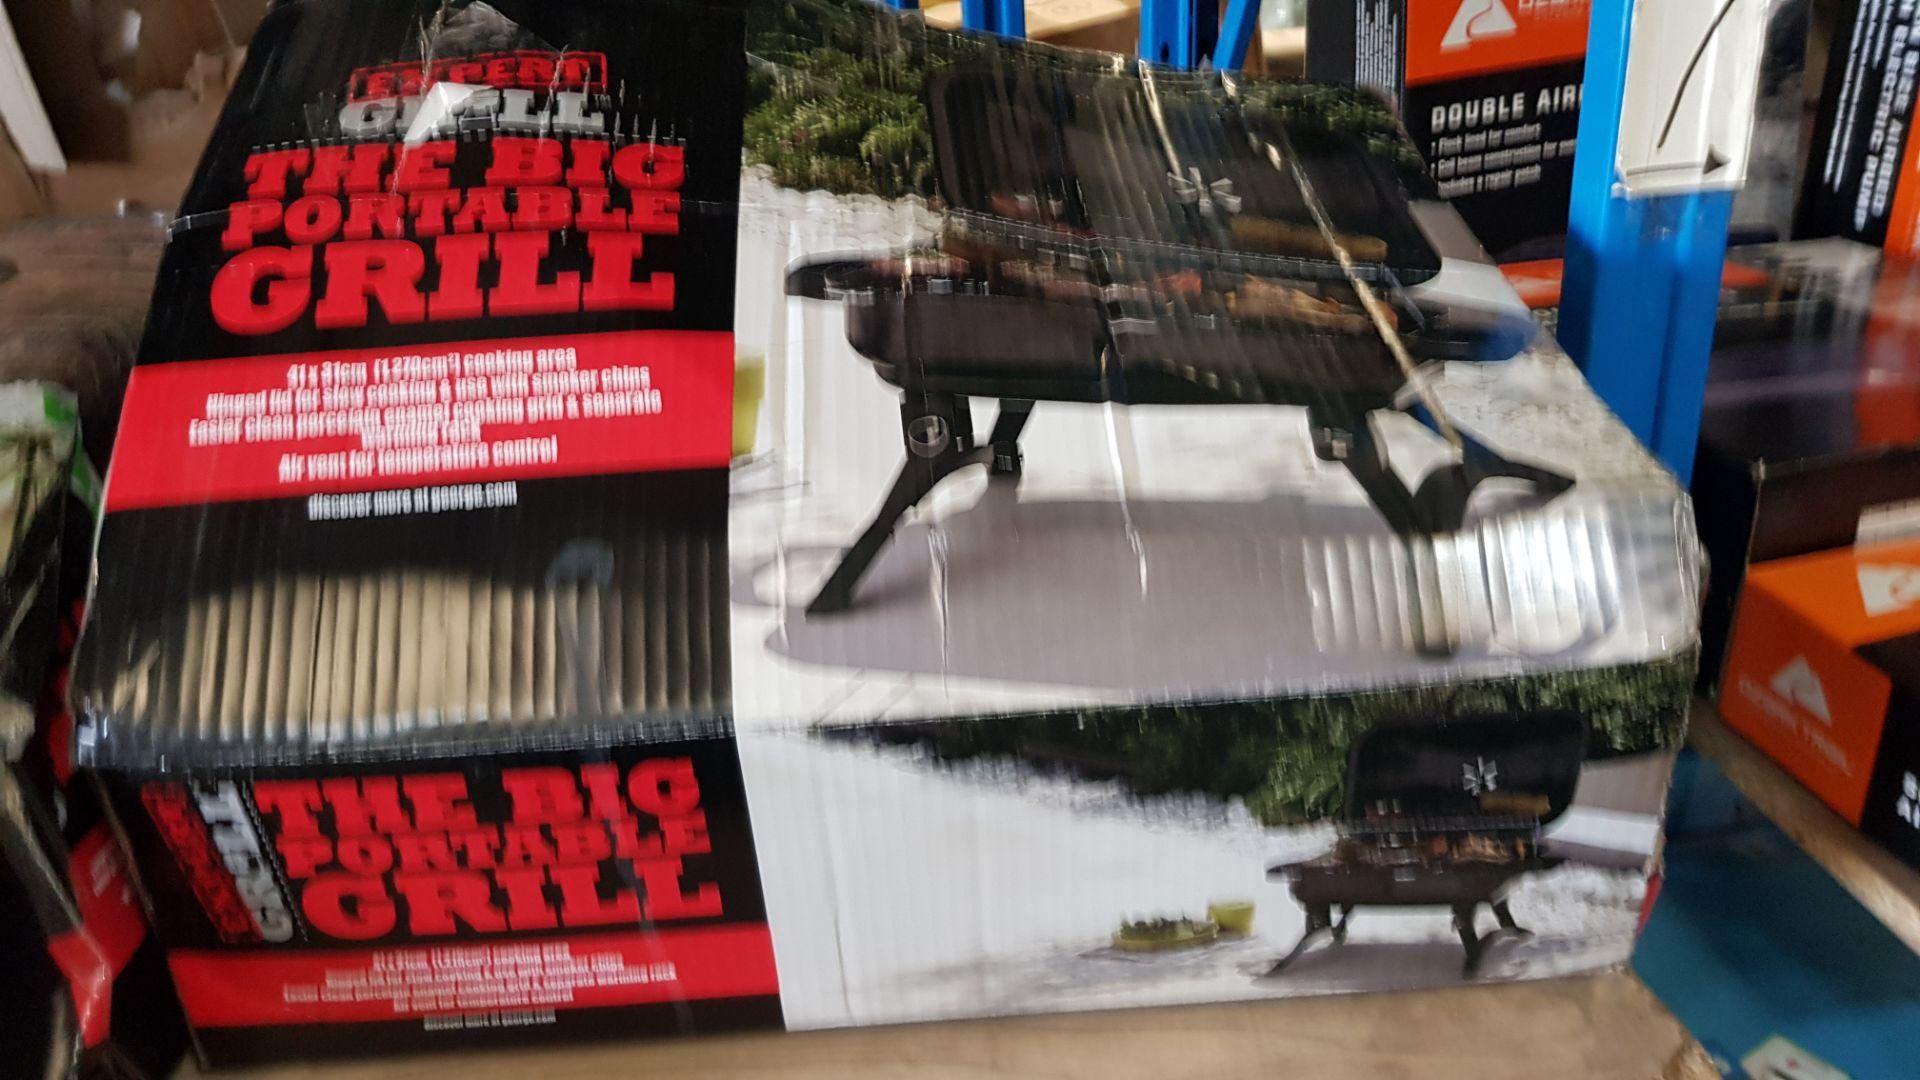 (3H) 4x BBQ Items. 1x Expert Grill The Big Portable Grill. 1x Expert Grill 75cm Barrell BBQ. 1x - Image 7 of 9